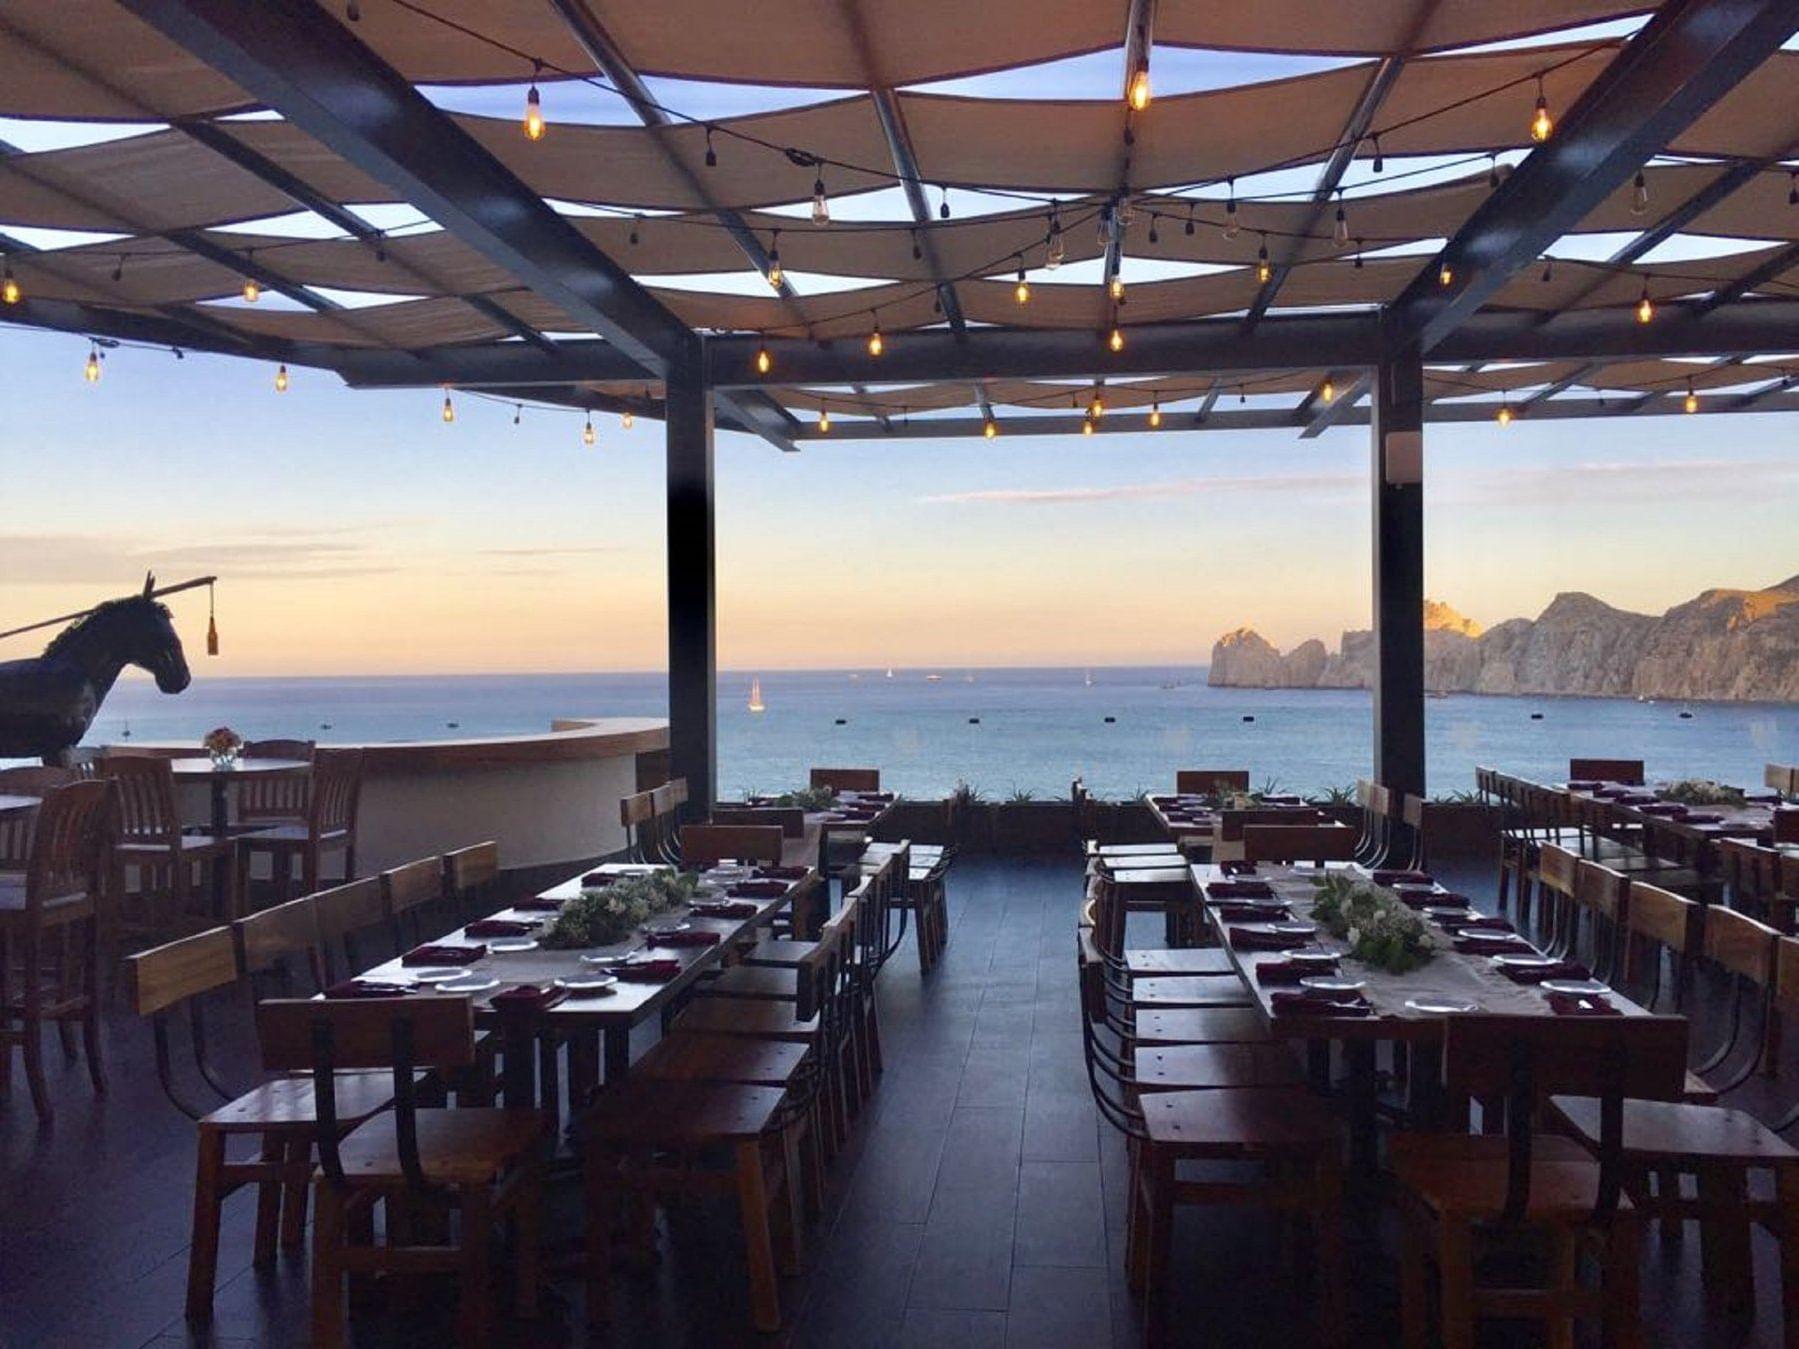 Outdoor seating in Baja Brewing at Cabo Villas Beach Resort